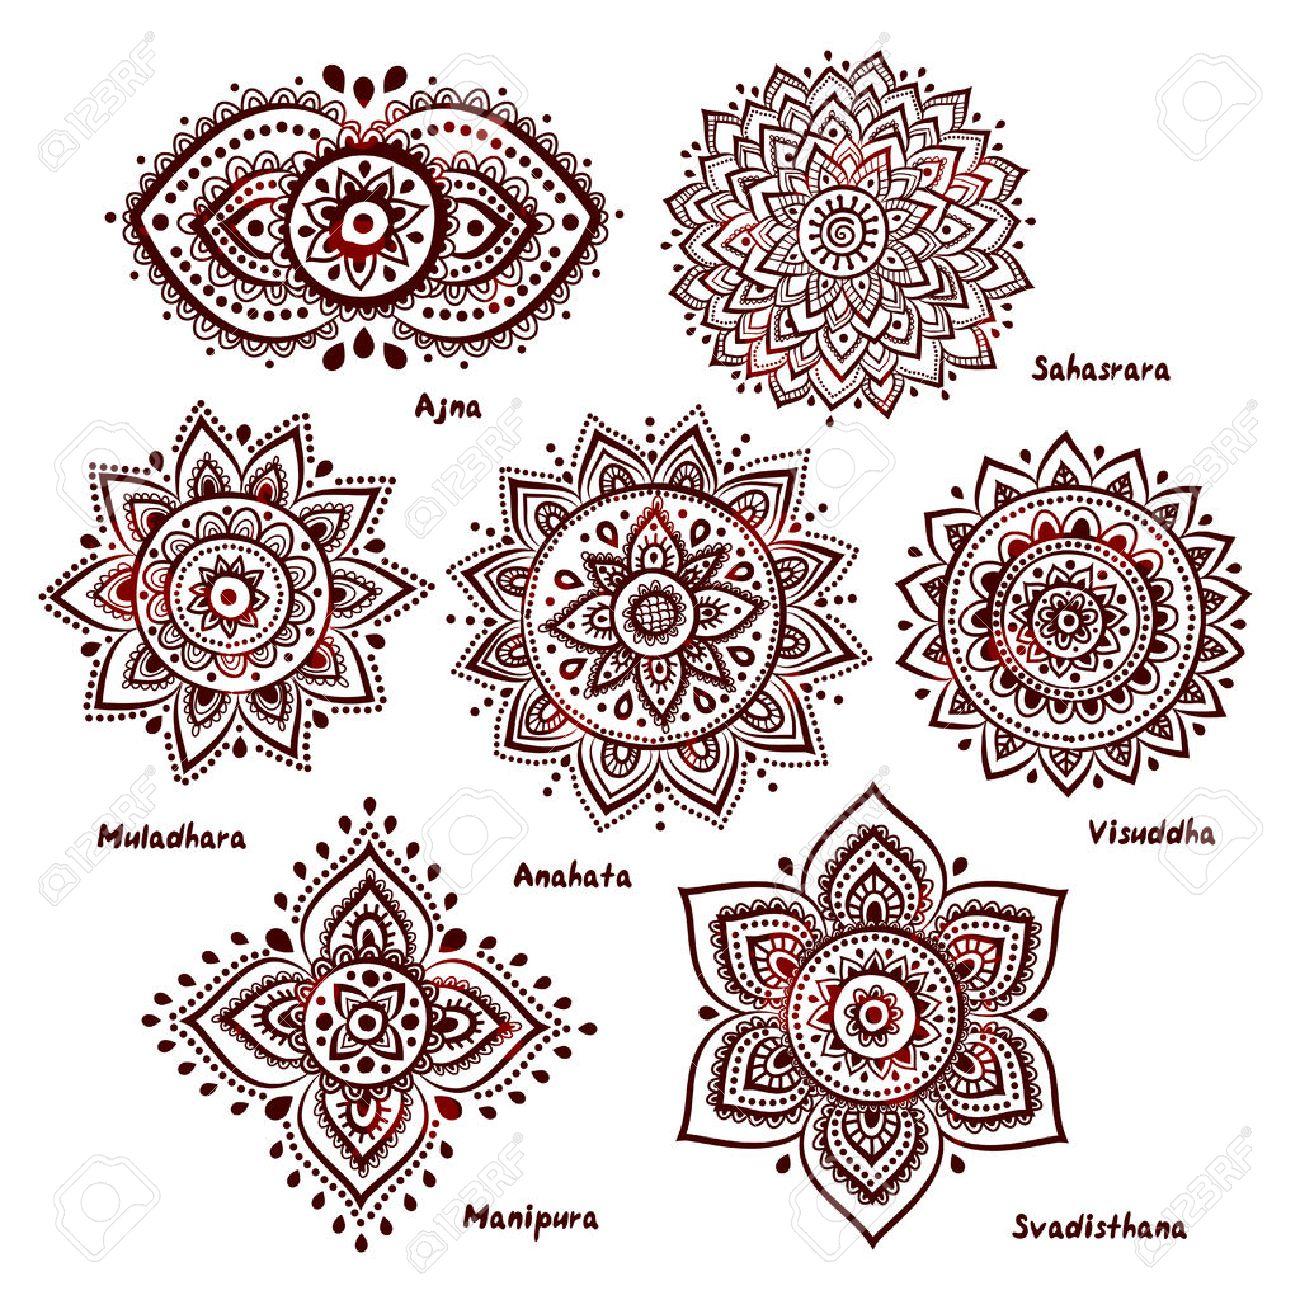 Isolated Set of beautiful ornamental 7 chakras Stock Vector - 28869577